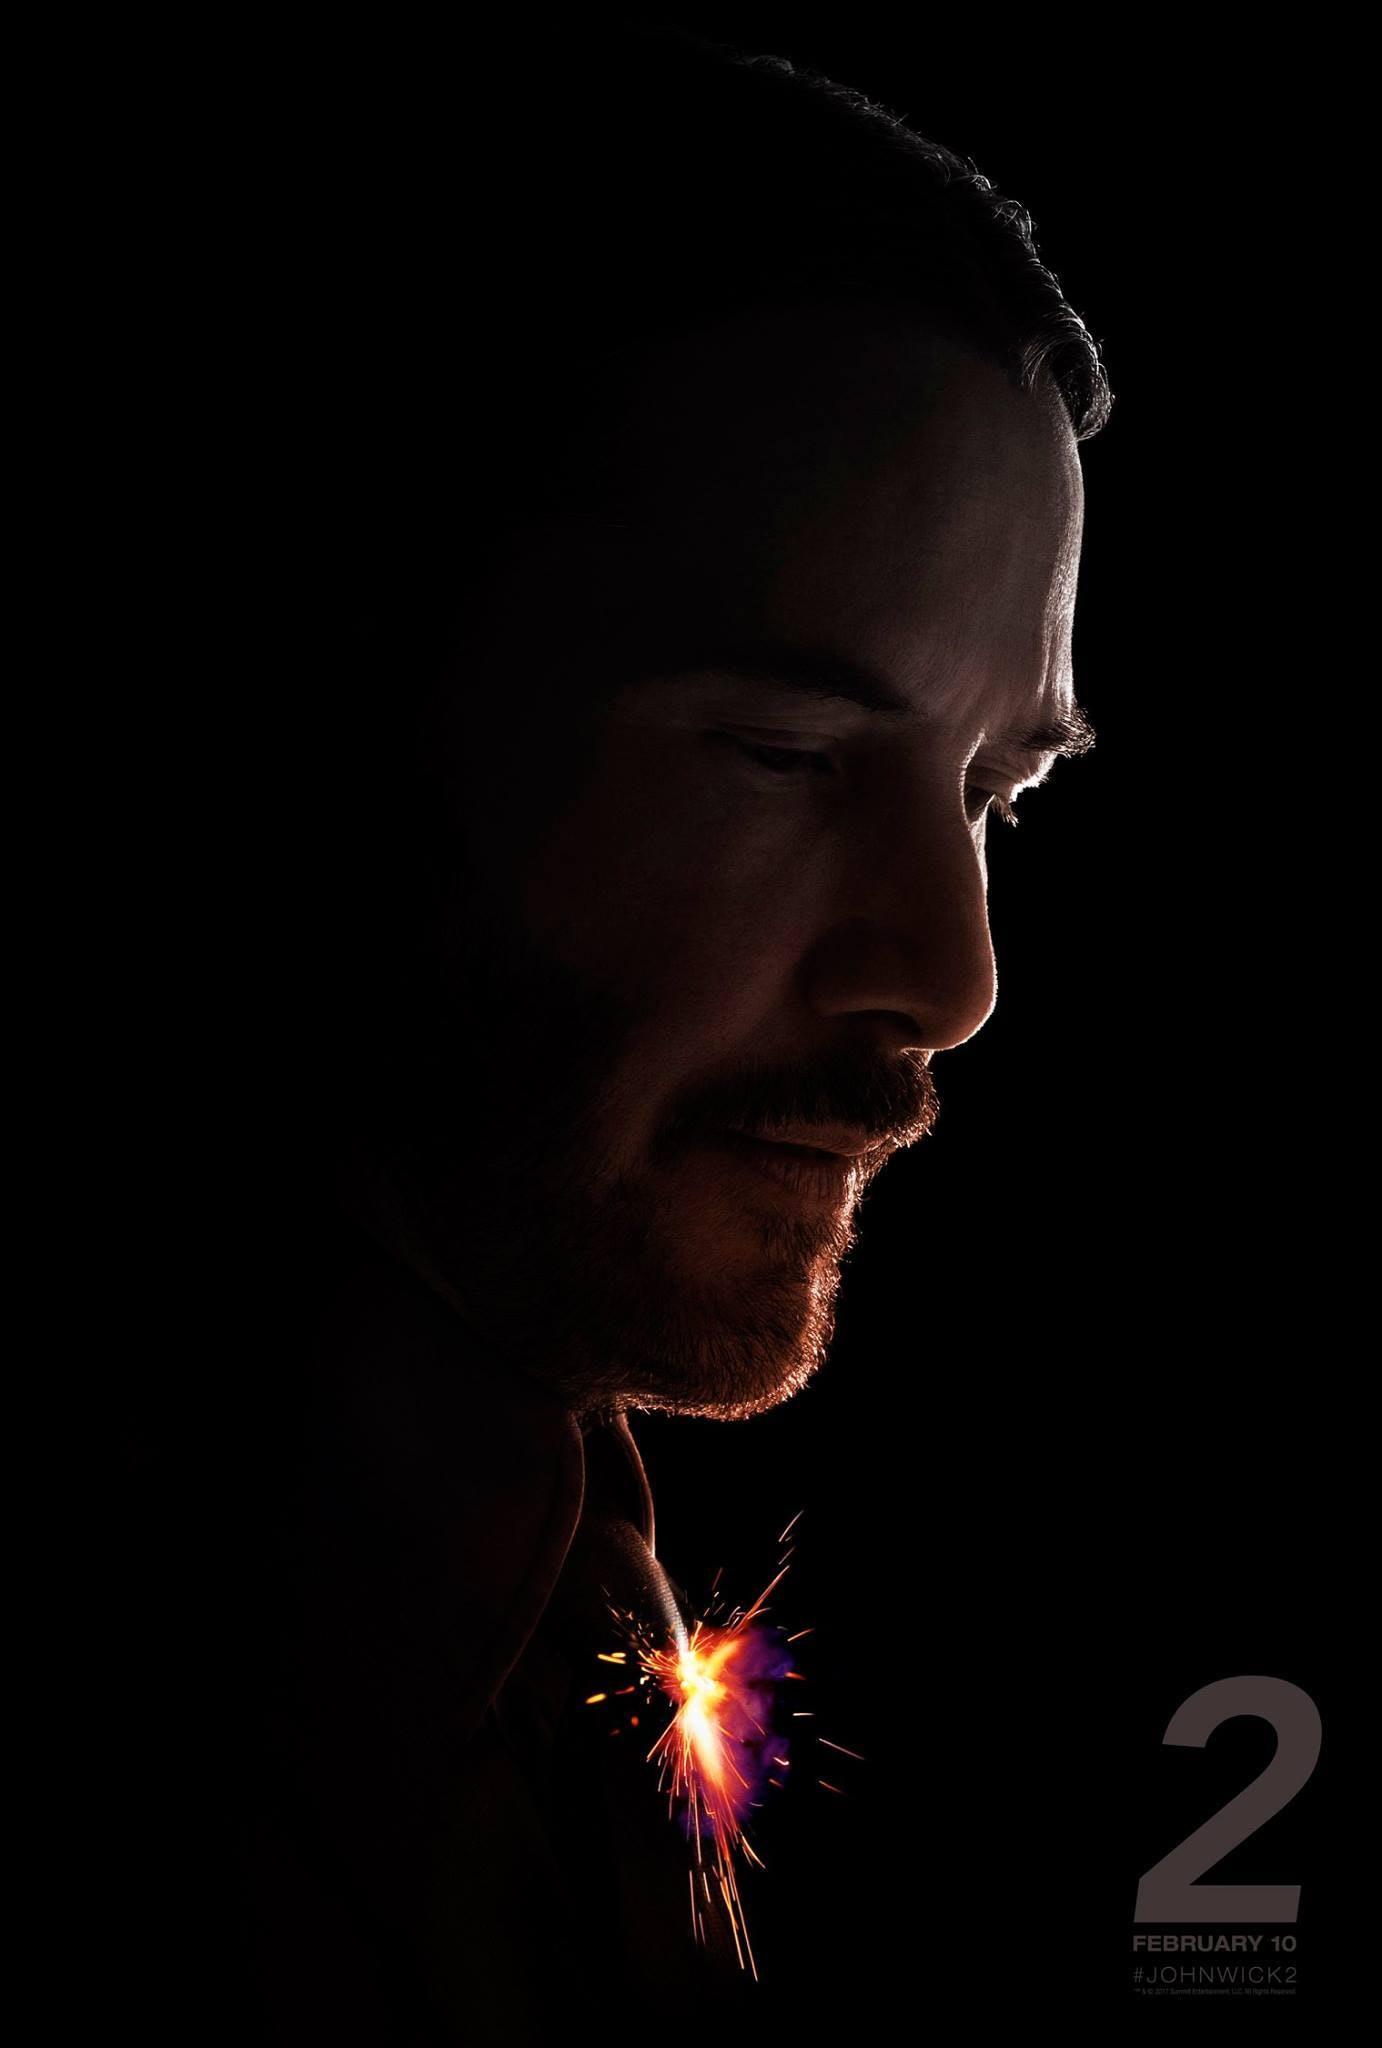 'John Wick: Chapter 2' poster.